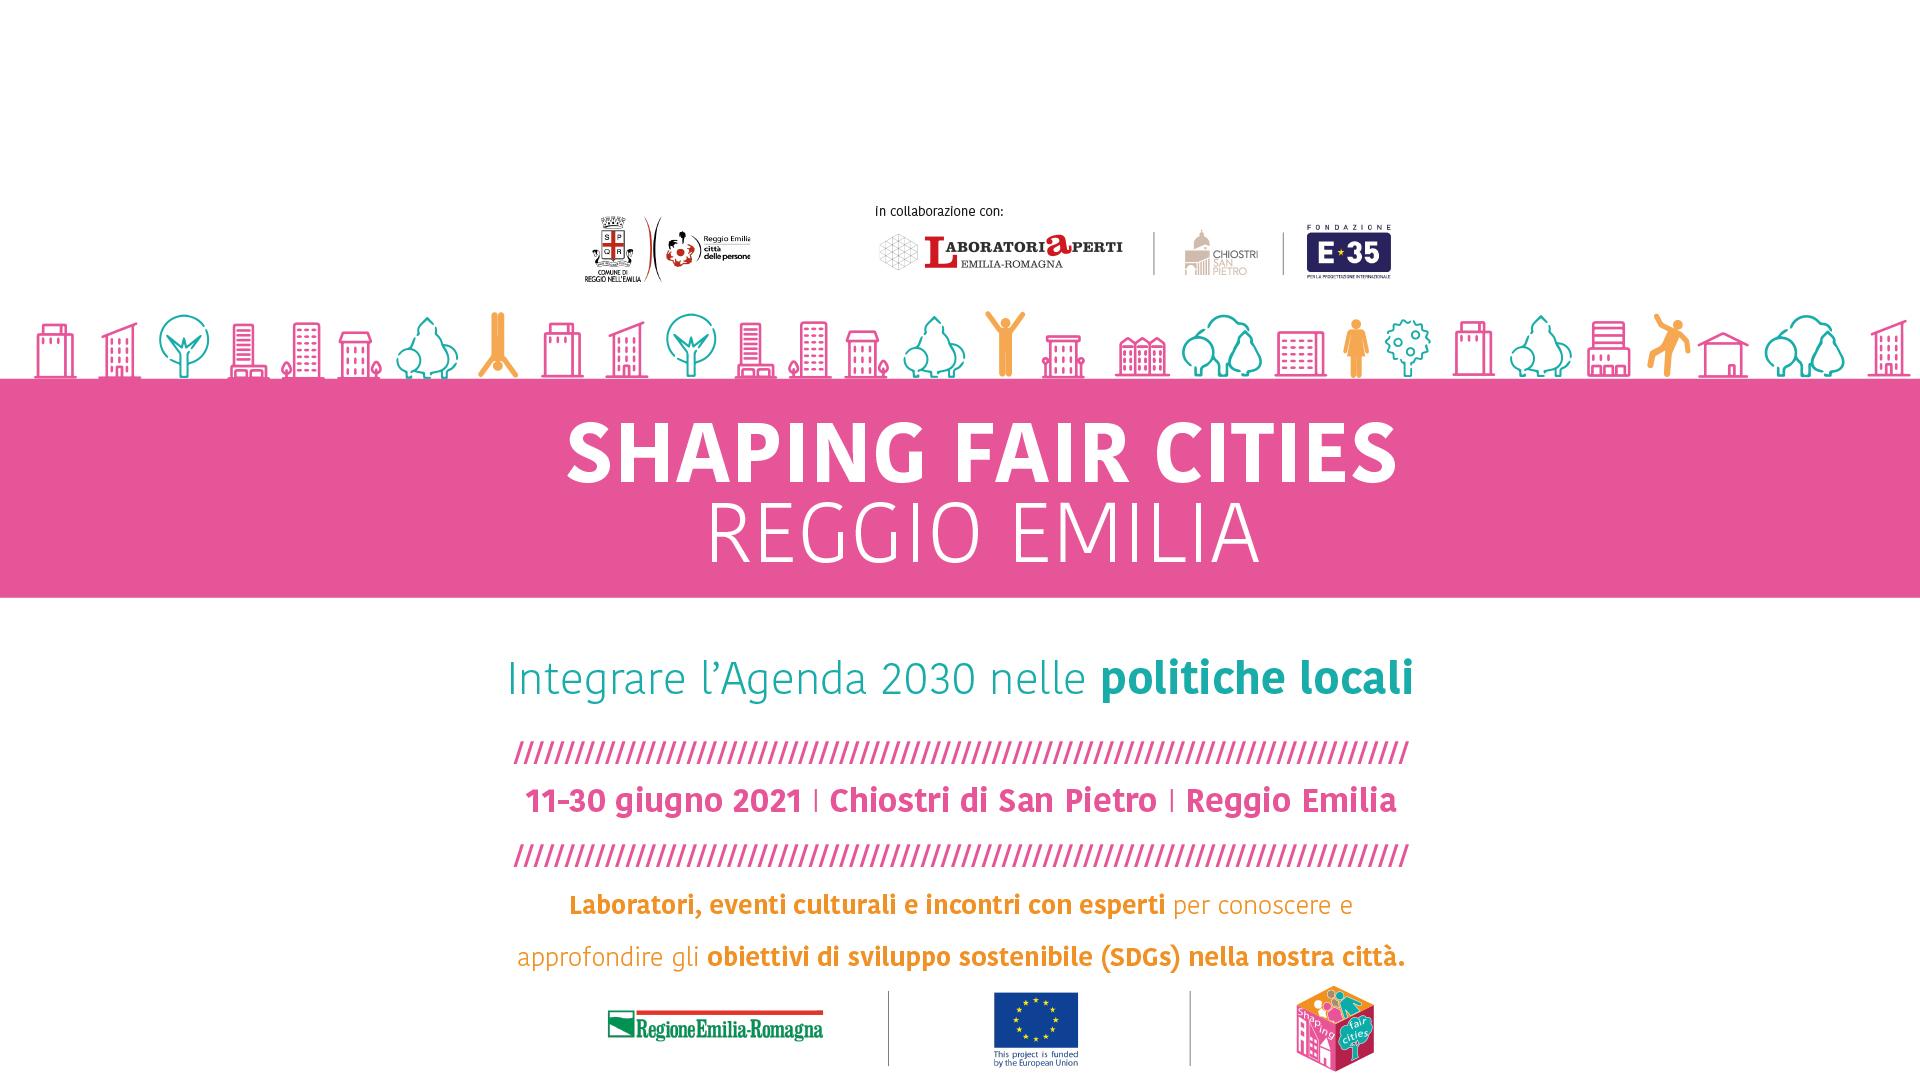 shaping-fair-cities